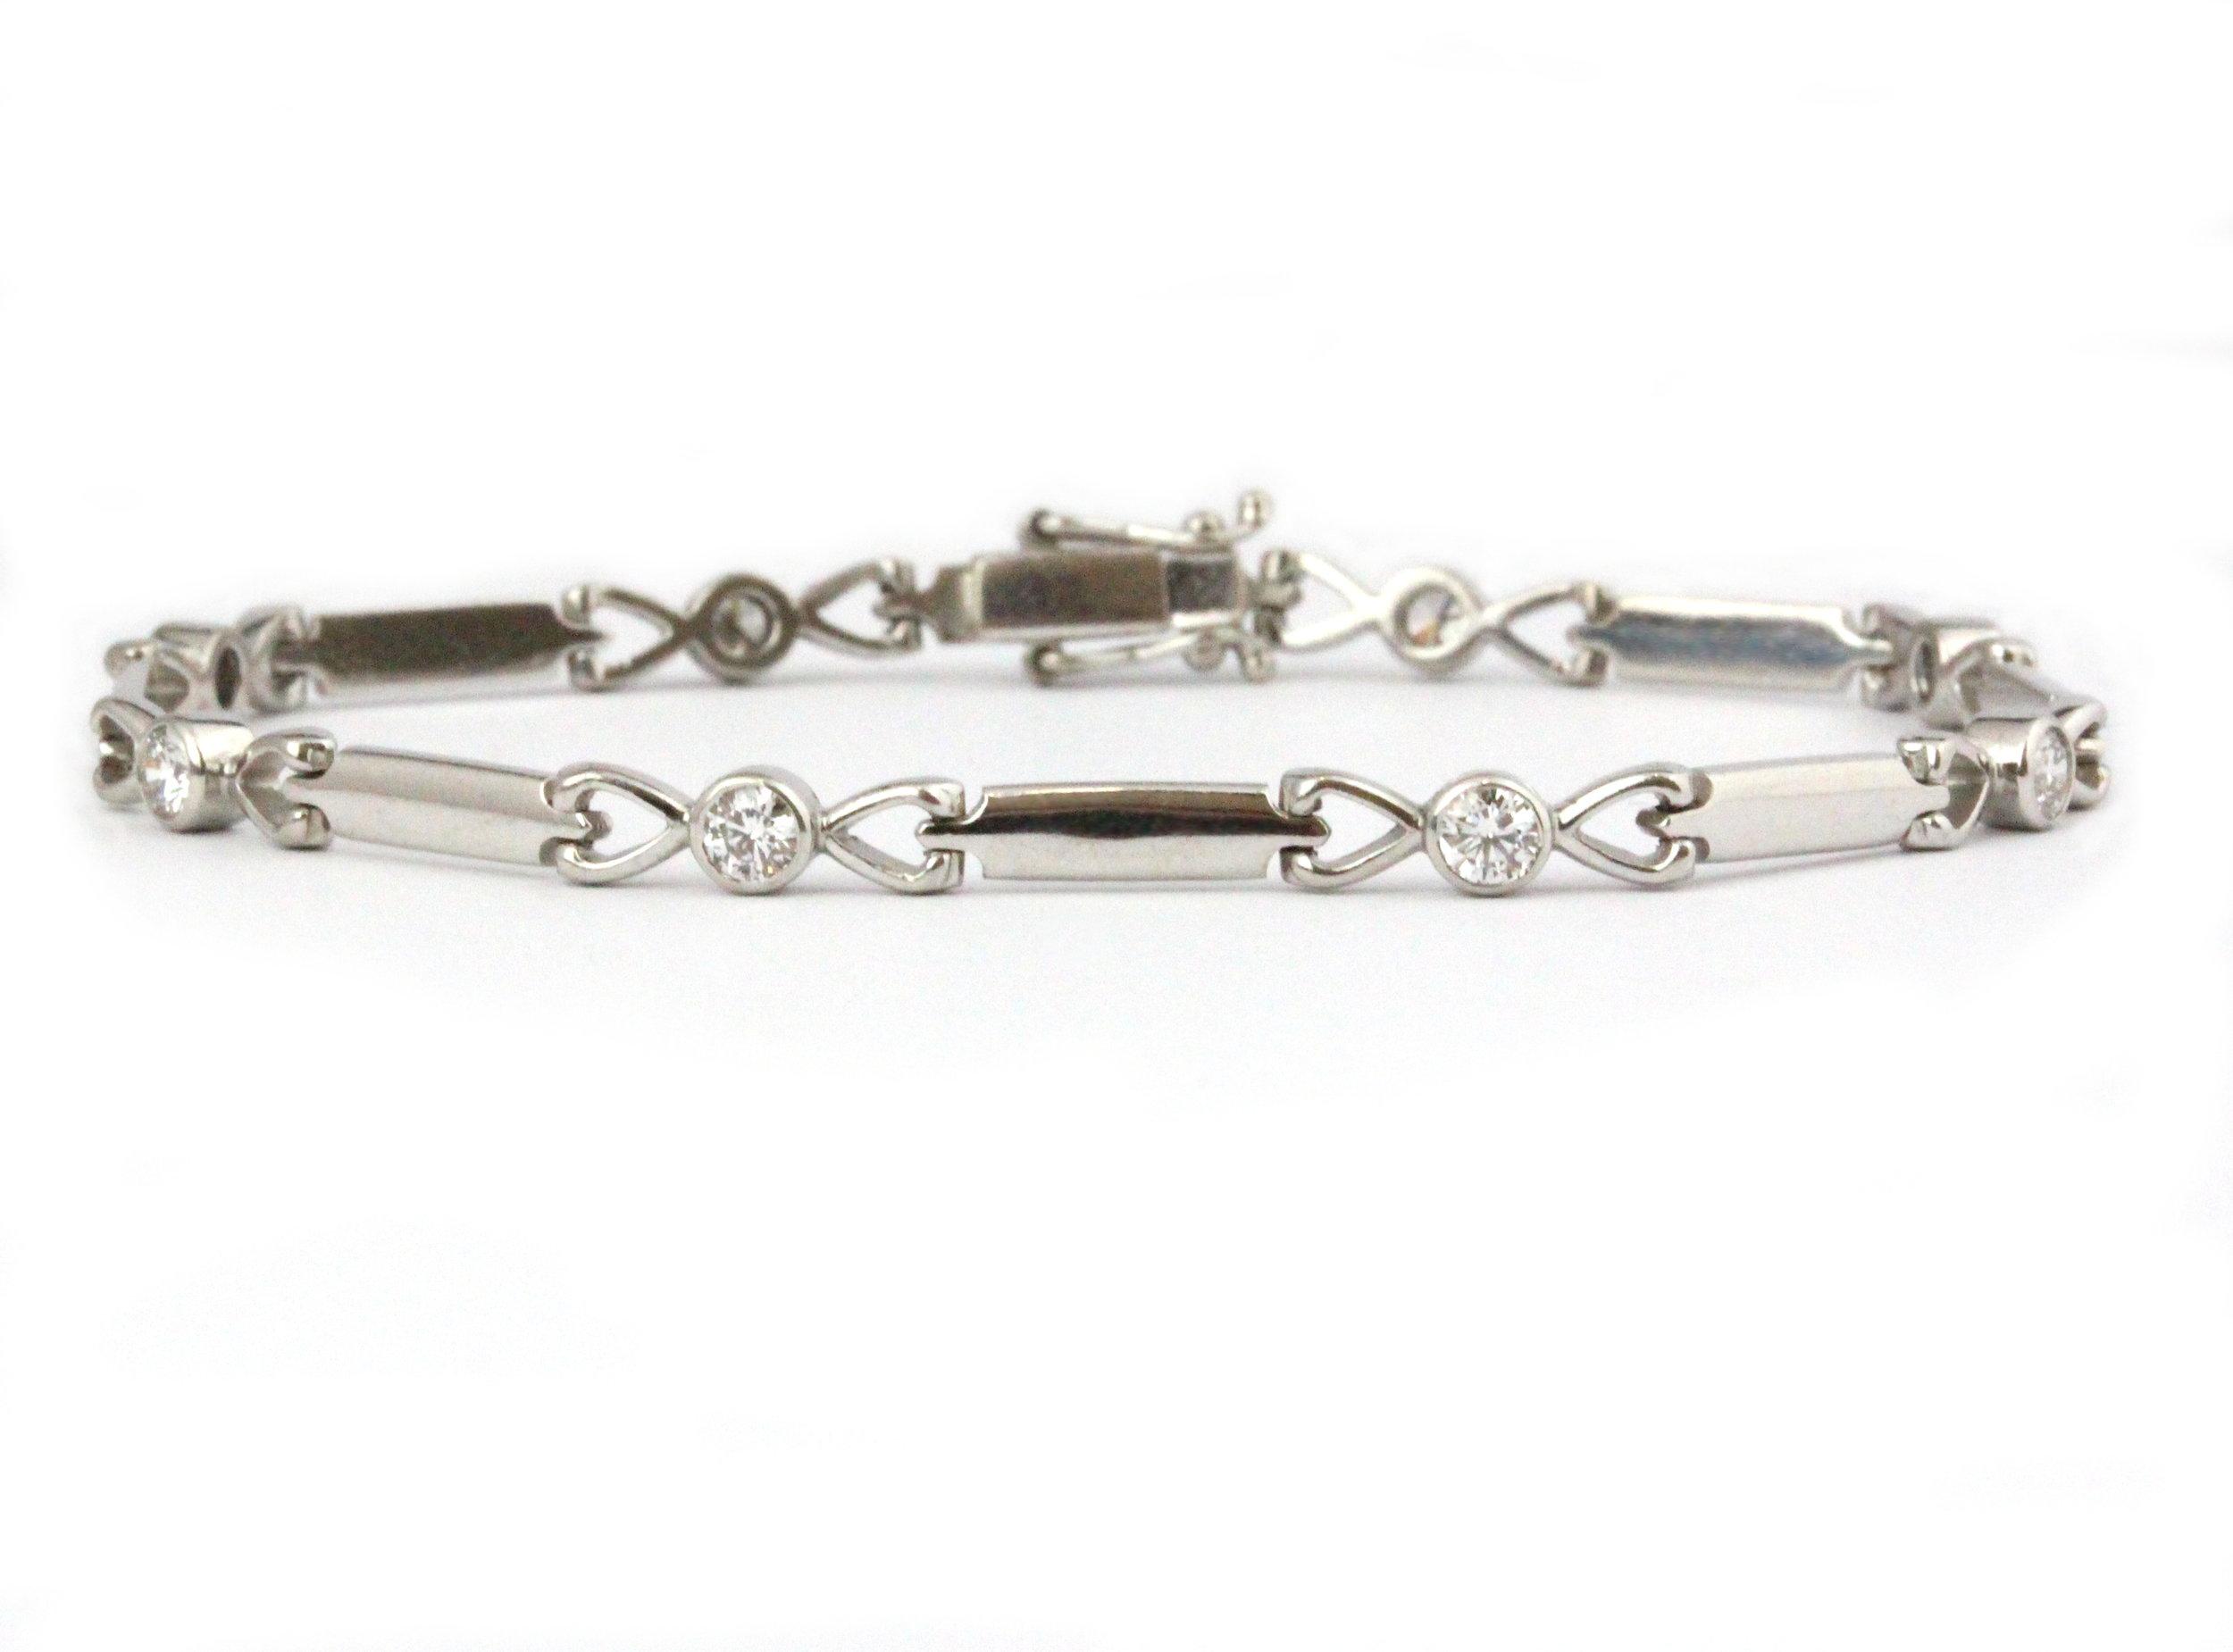 White gold bracelet with heart links and bezel set diamonds.